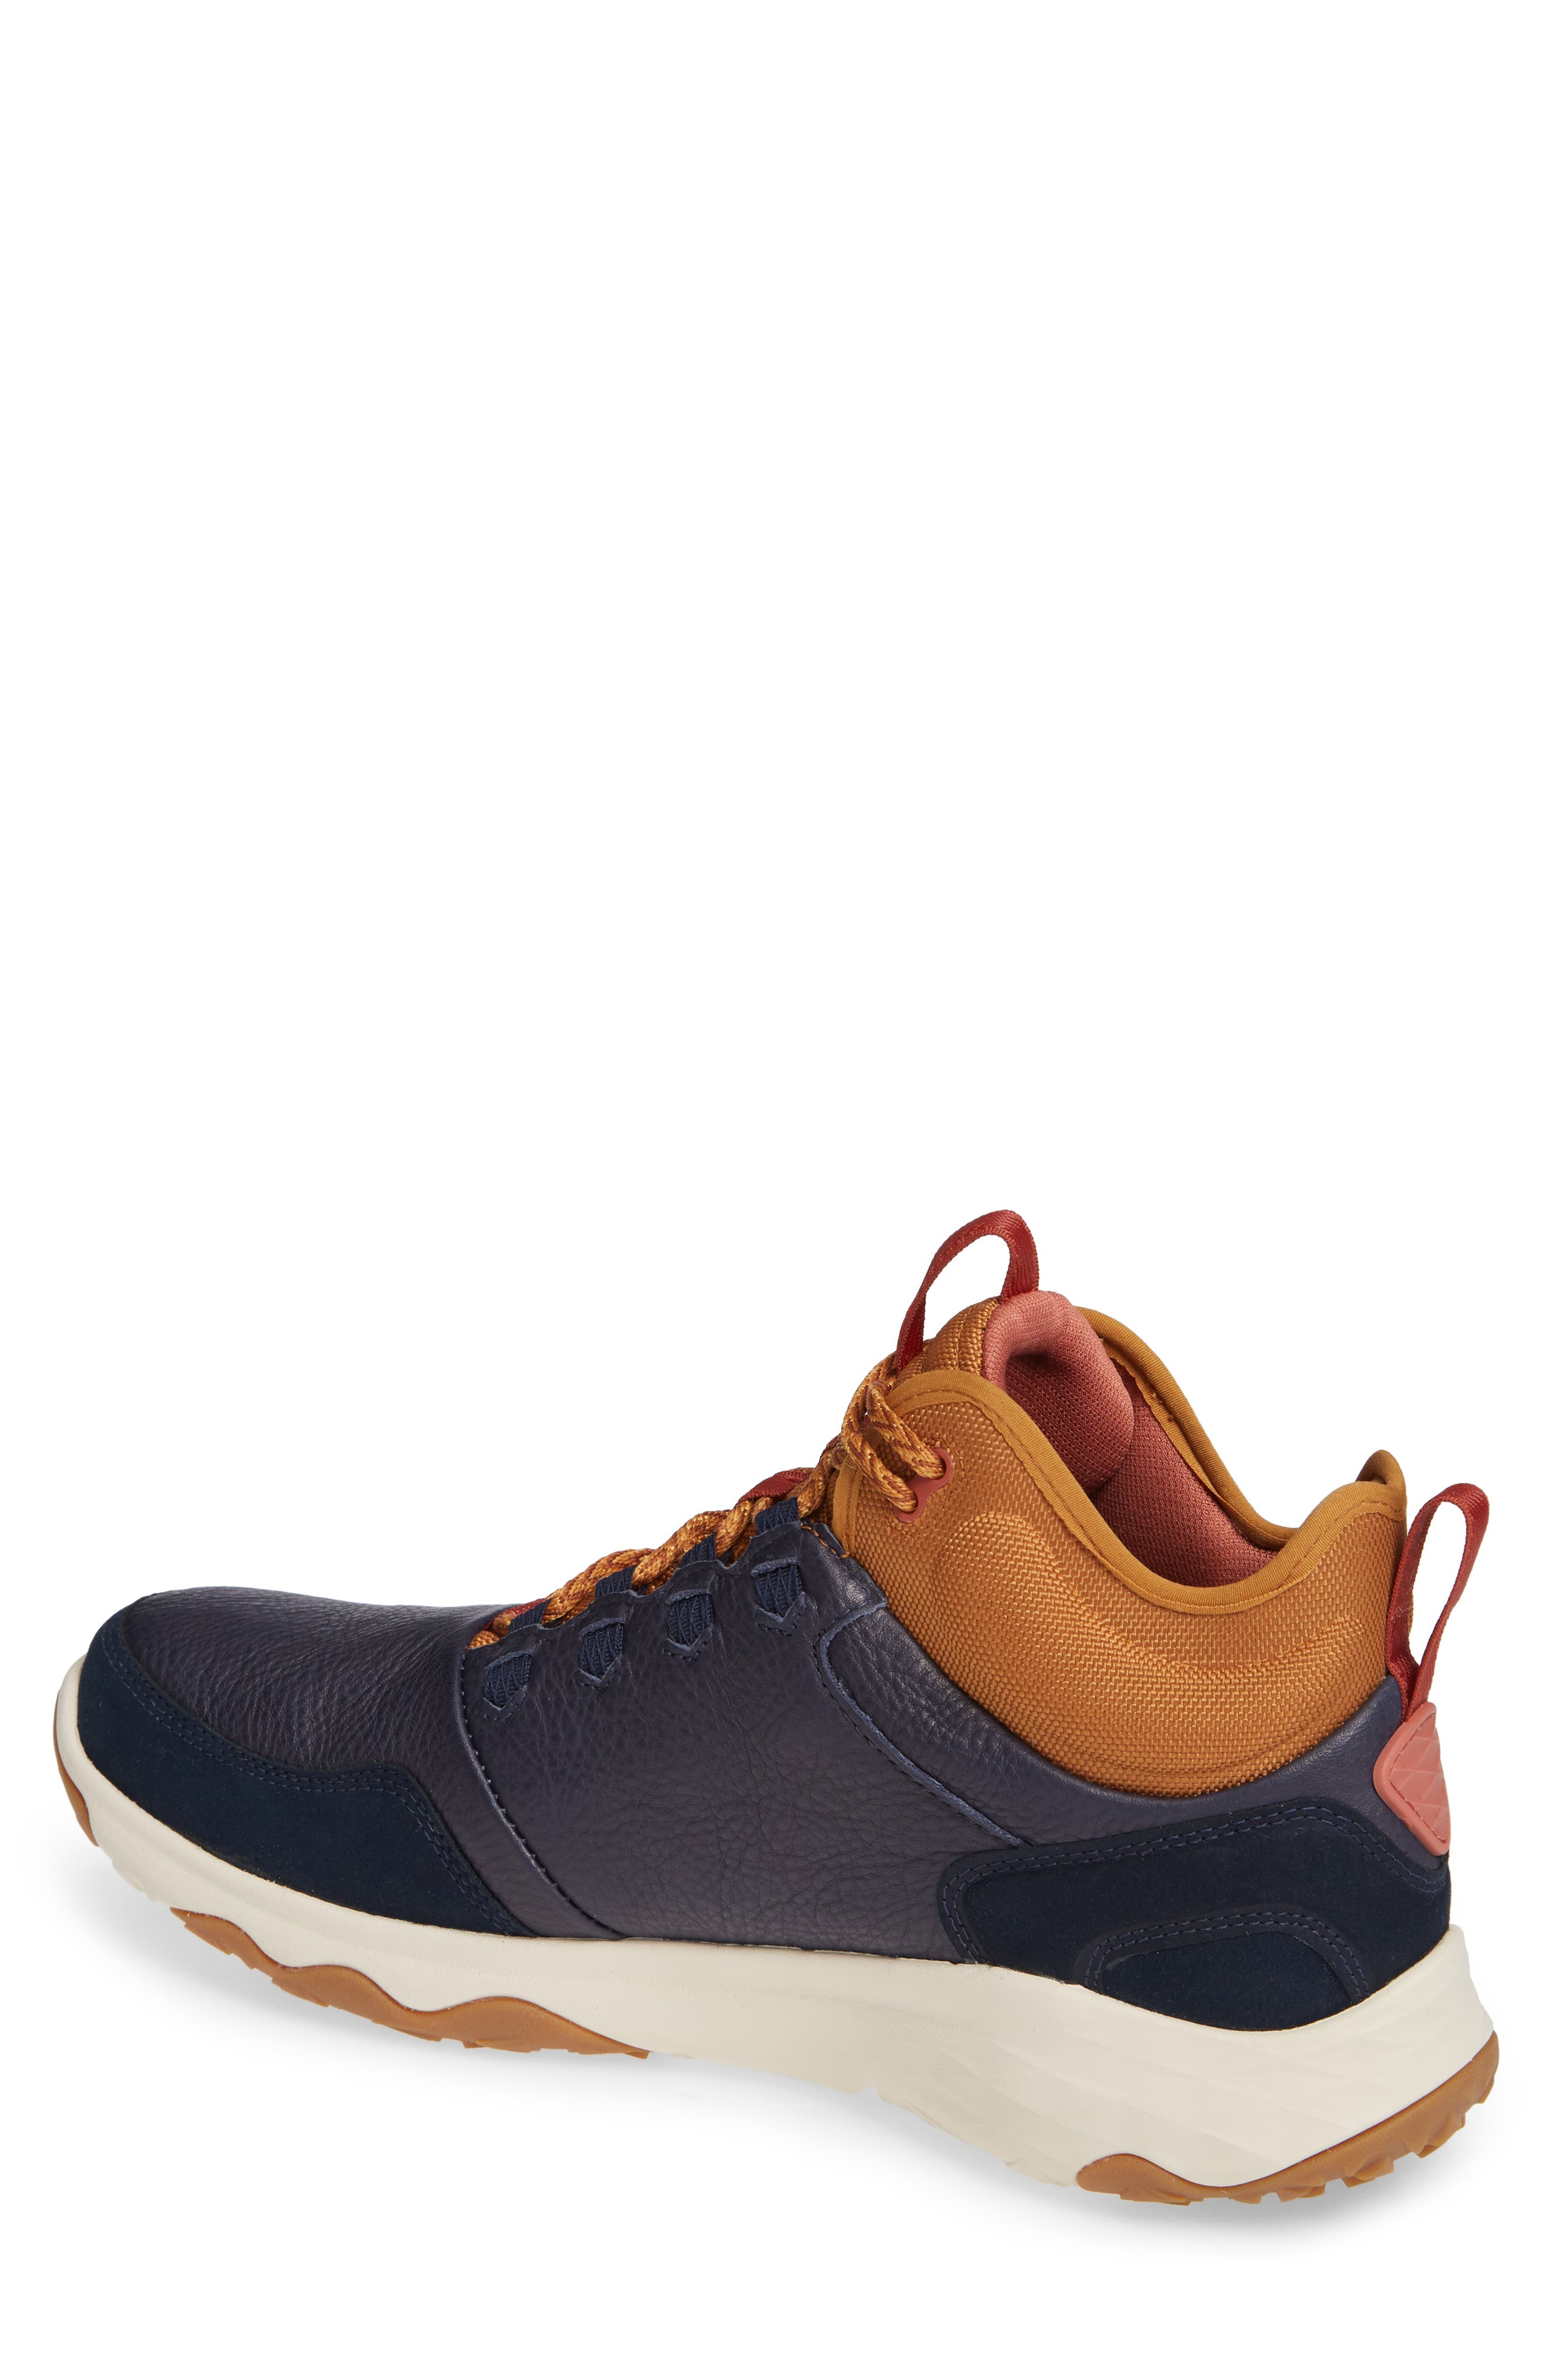 Arrowood 2 Mid Waterproof Sneaker Boot,                             Alternate thumbnail 2, color,                             MIDNIGHT NAVY LEATHER